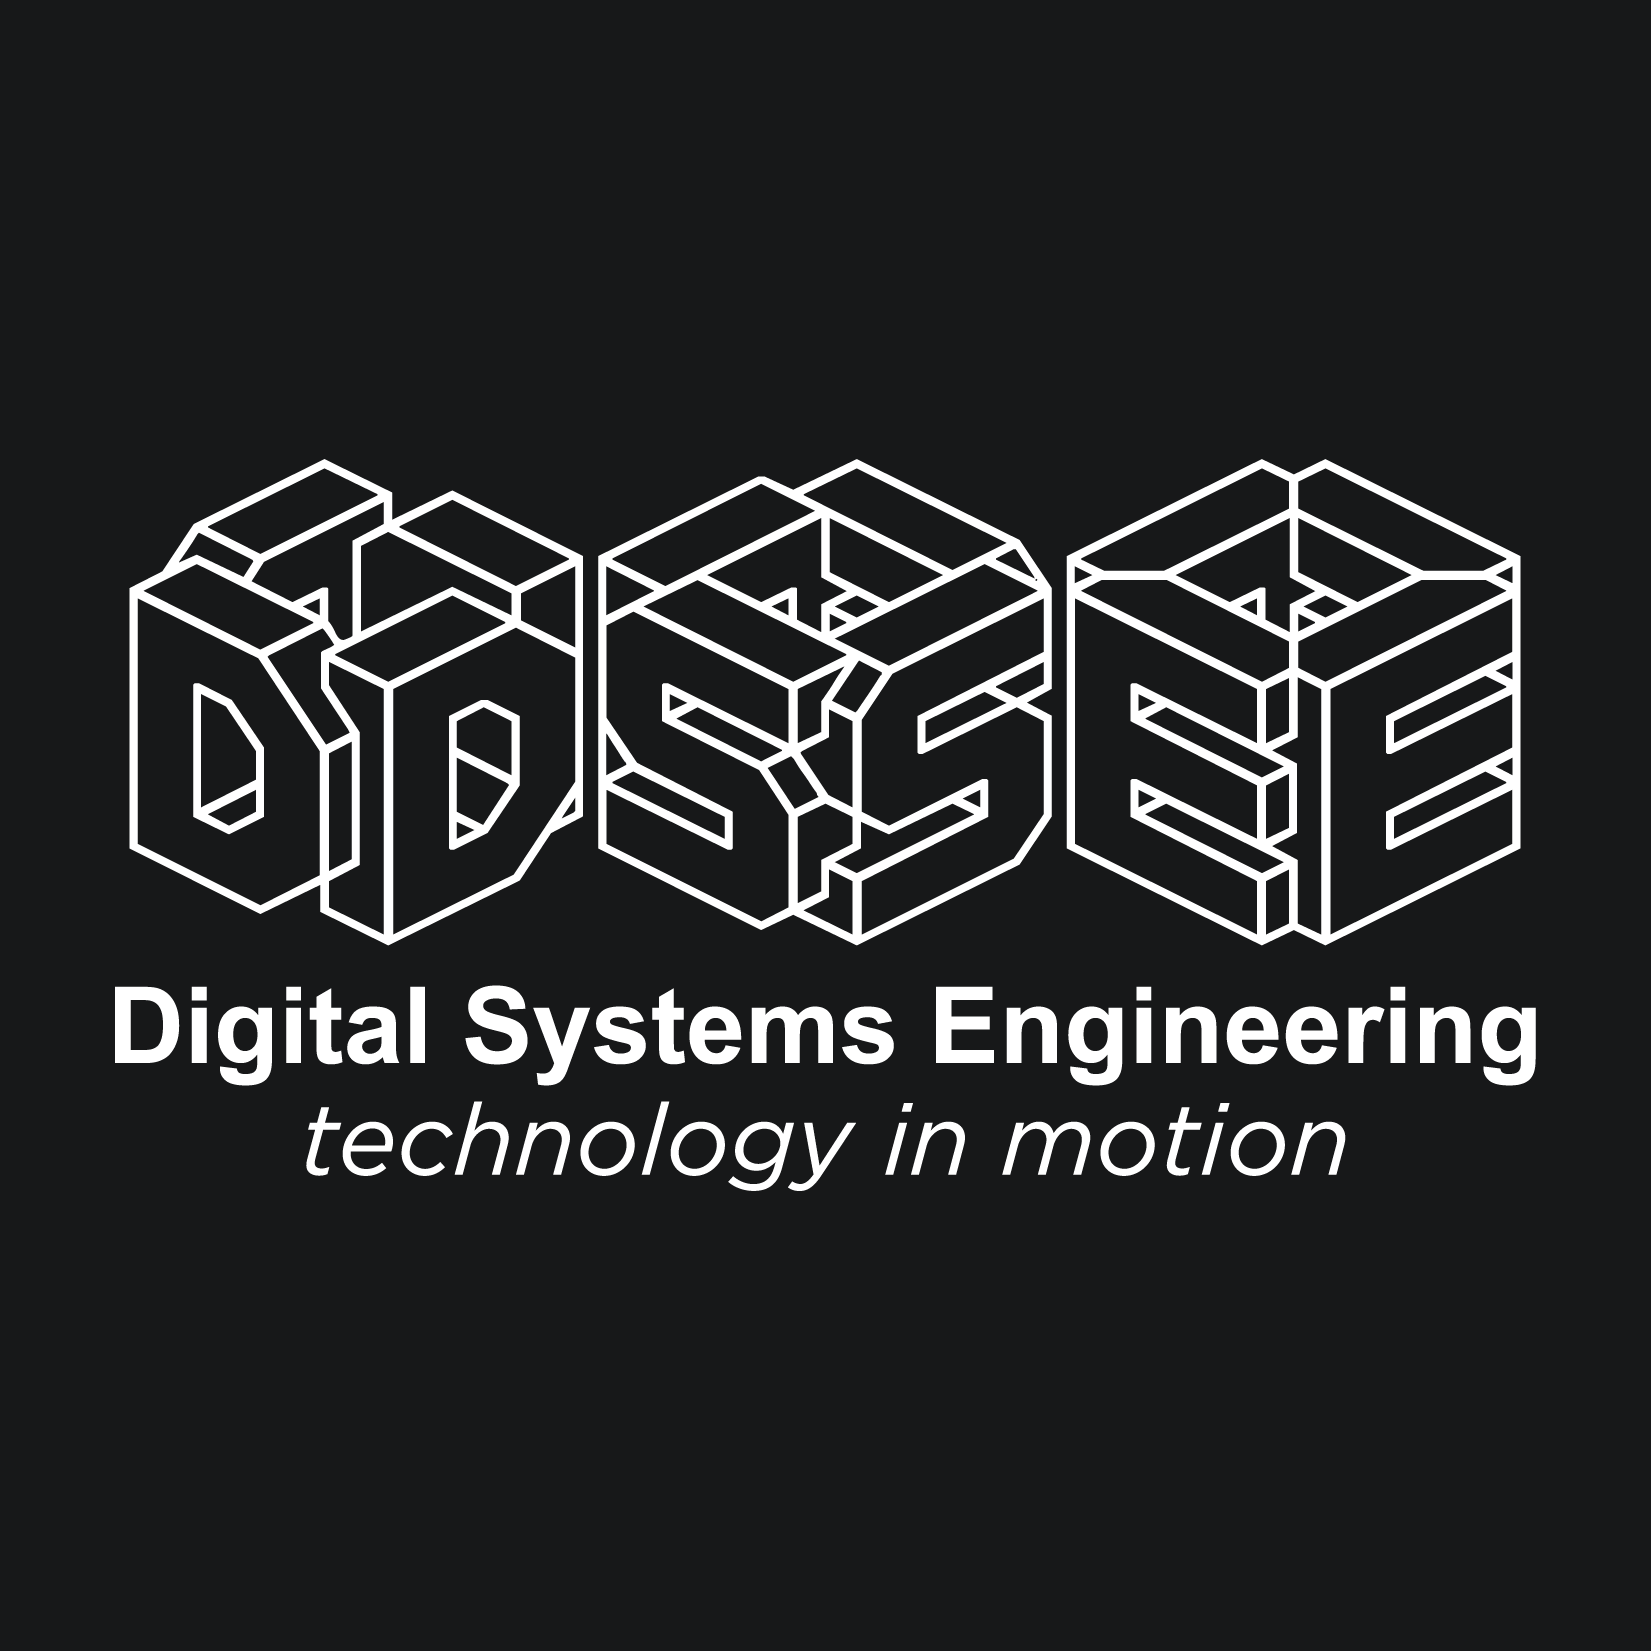 Digital Systems Engineering Logo